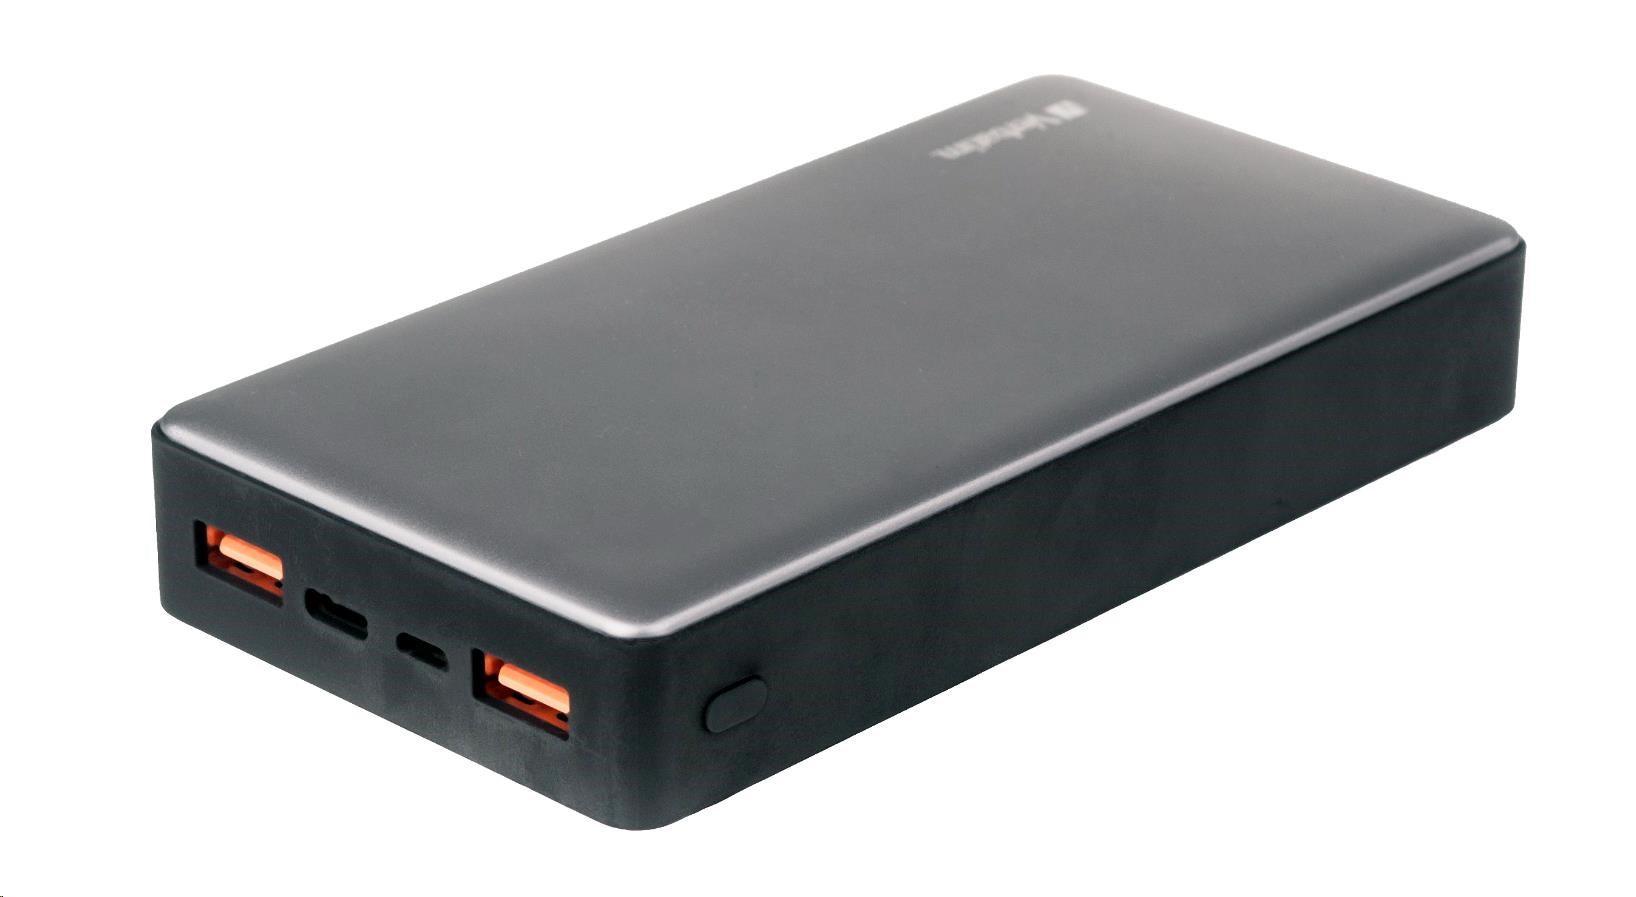 VERBATIM 20 000mAh Power Bank with Quick Charge USB/USB-C